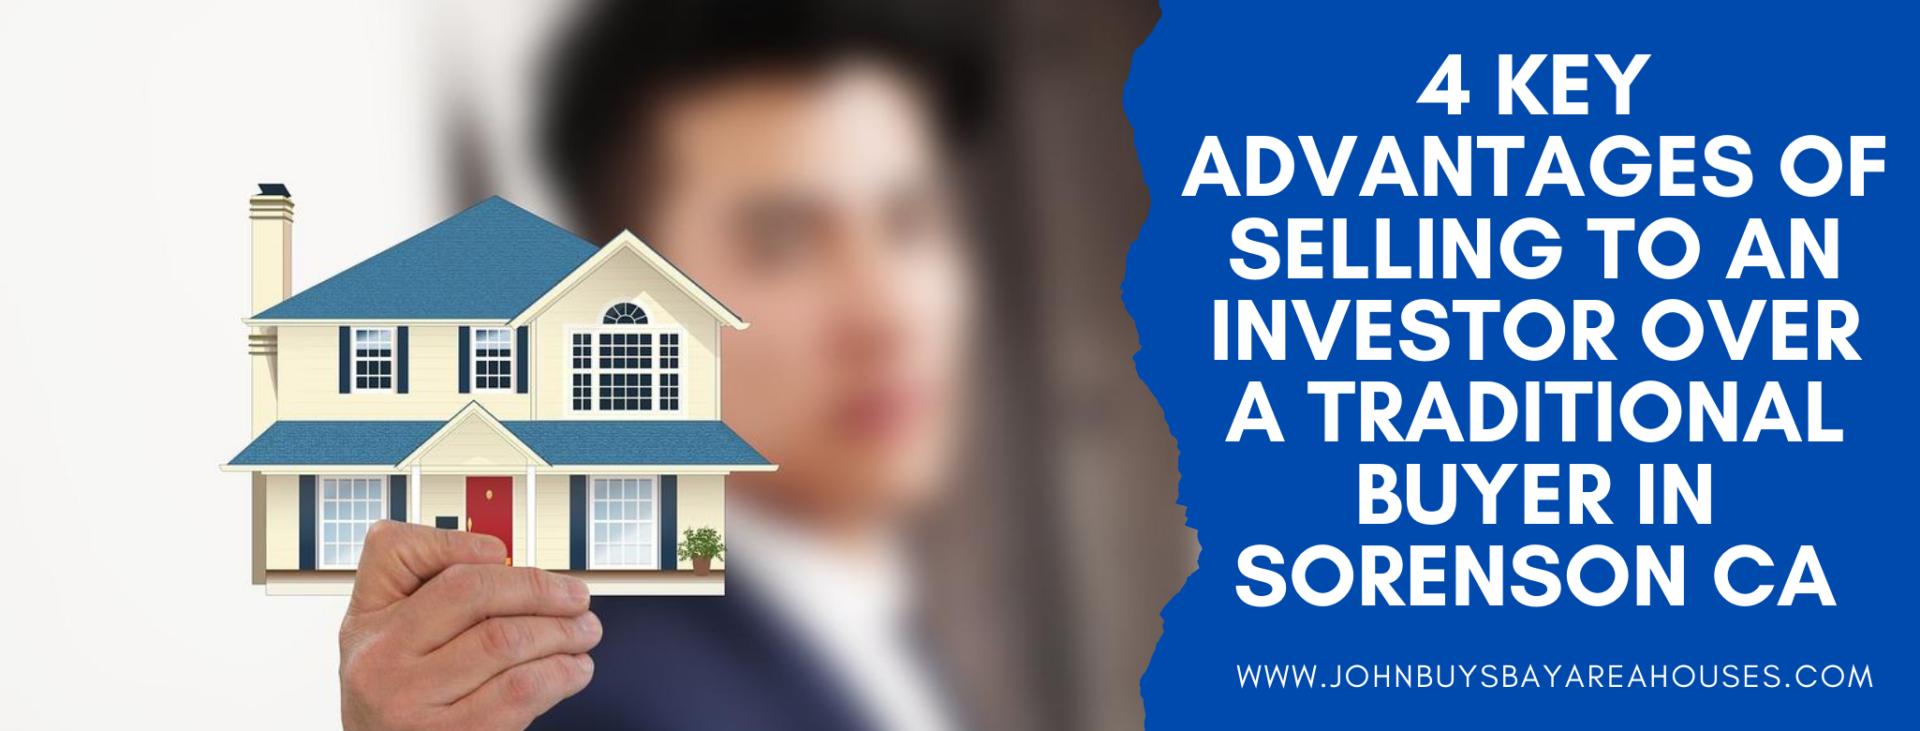 We buy properties in Sorenson CA